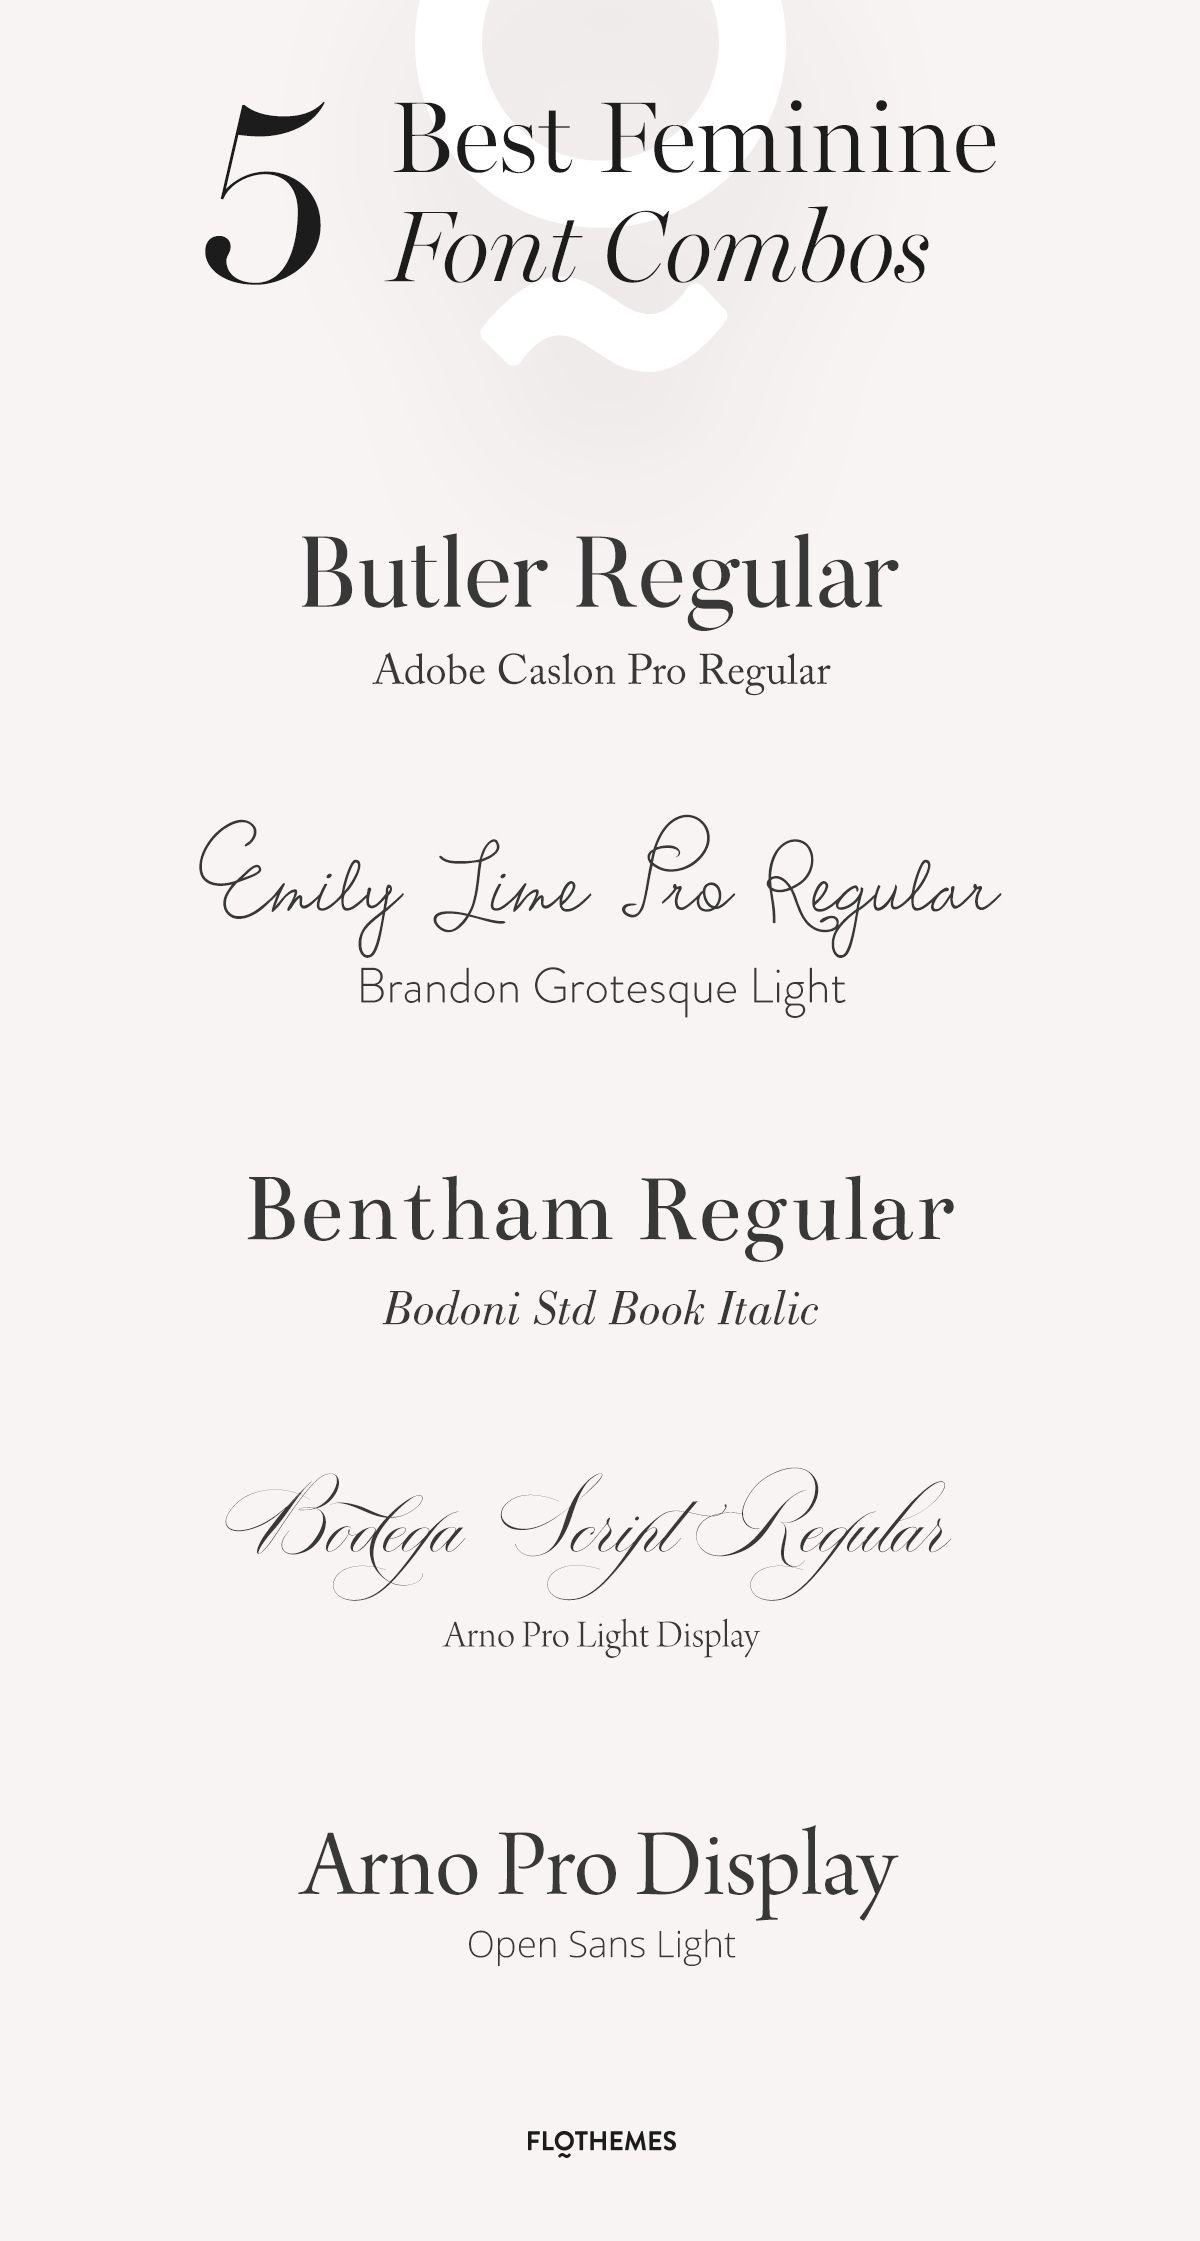 5 Best Feminine Font Combos #fonts #fontcombos